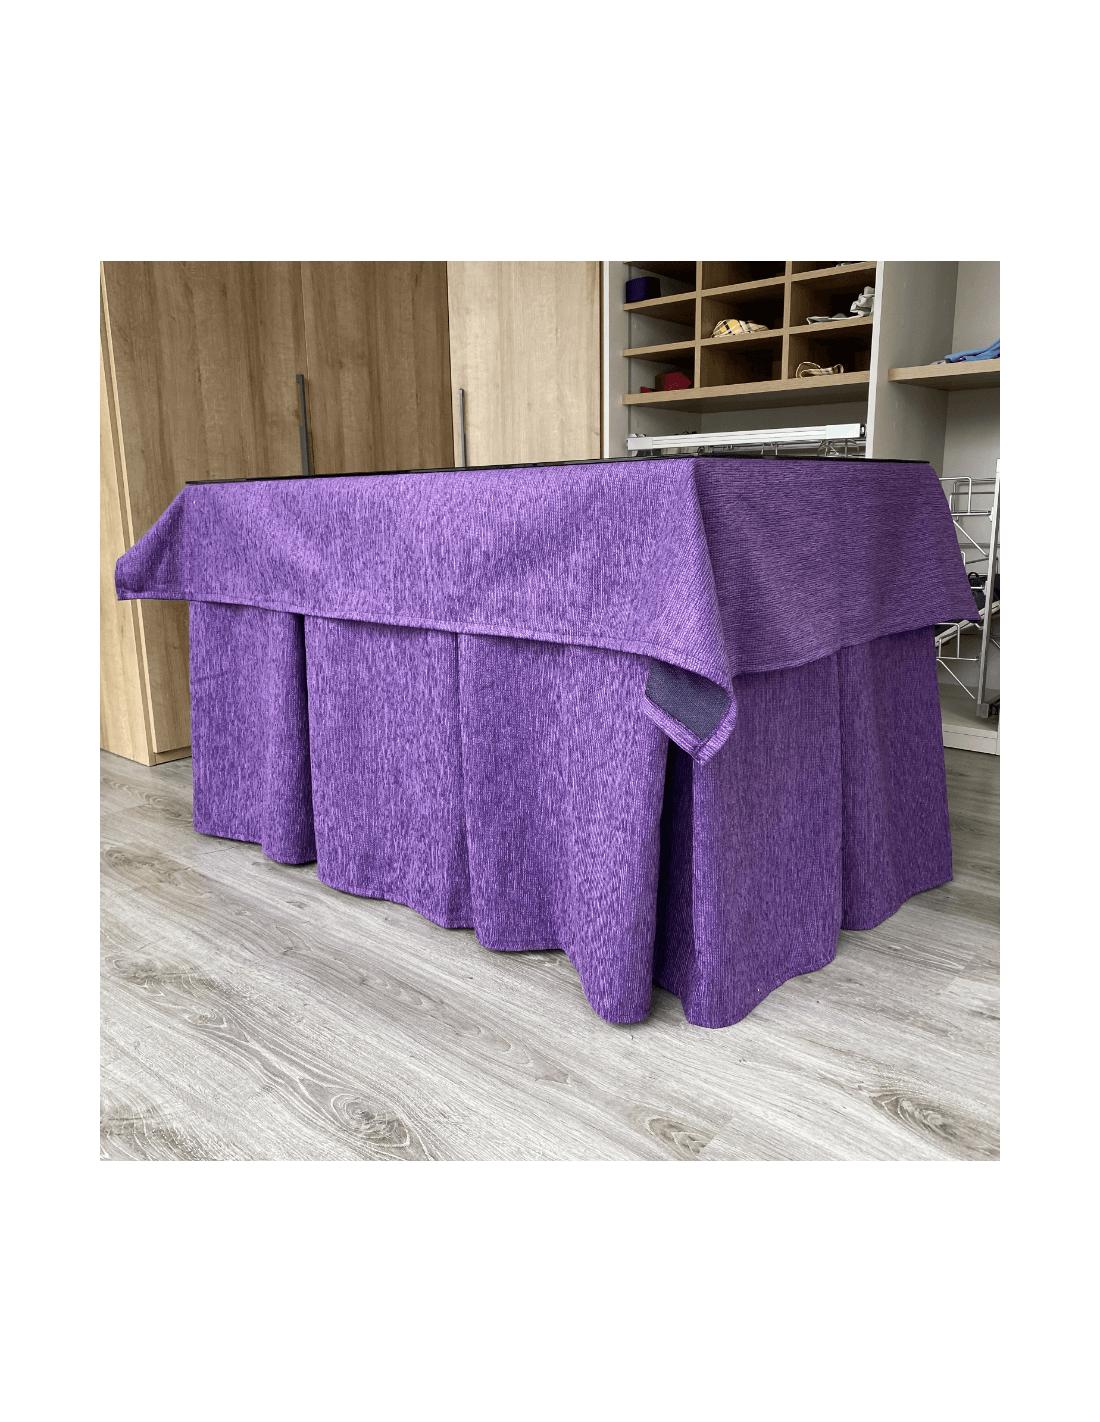 sofa 2 plazas relax reclinable y extraible muy odo tela antimanchas